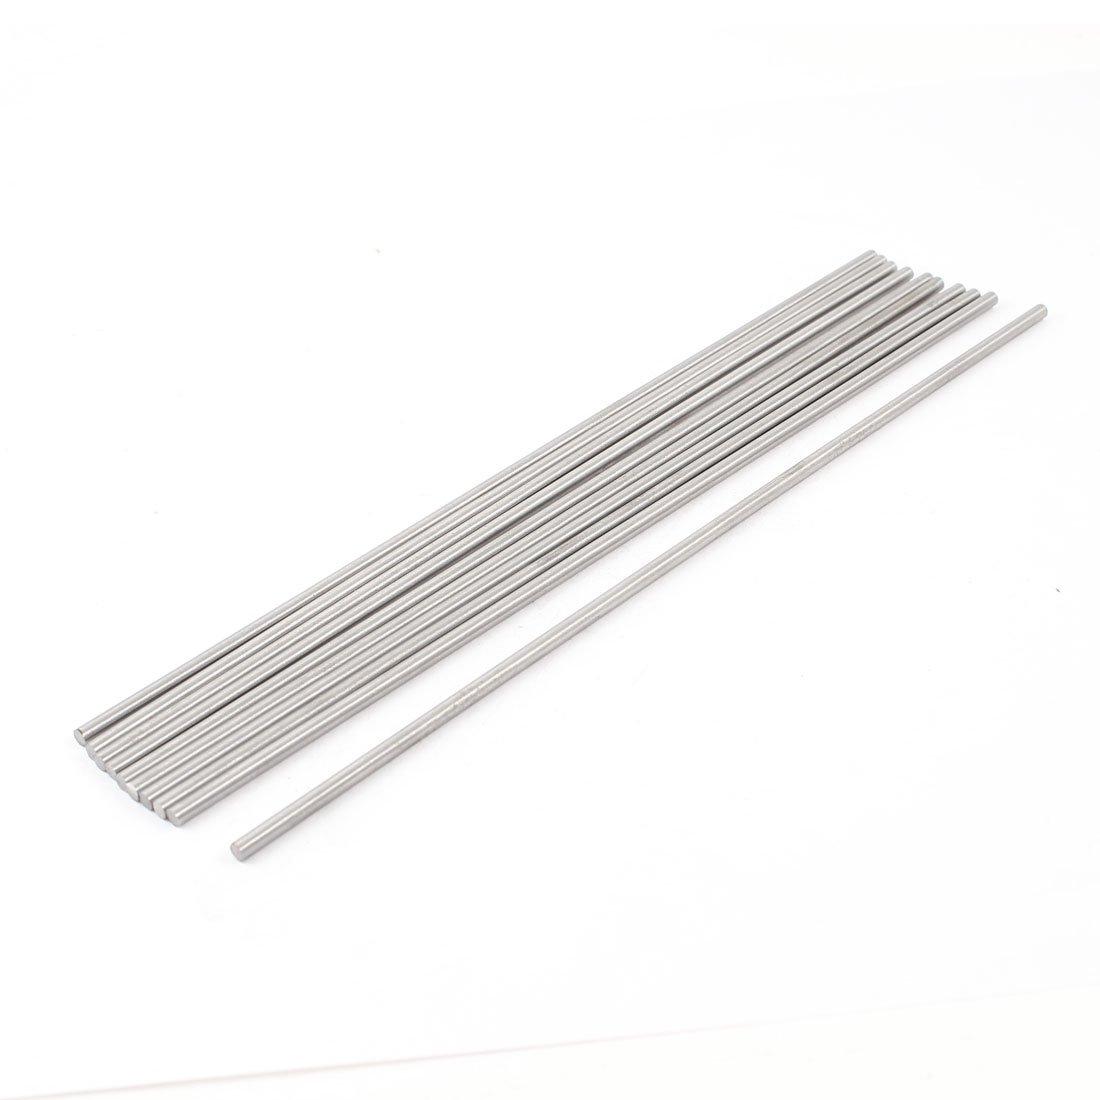 10 PCS 3mm Diameter 200mm Long Boring Tool Round Turning Lathe Bars Sourcingmap a14021900ux0107